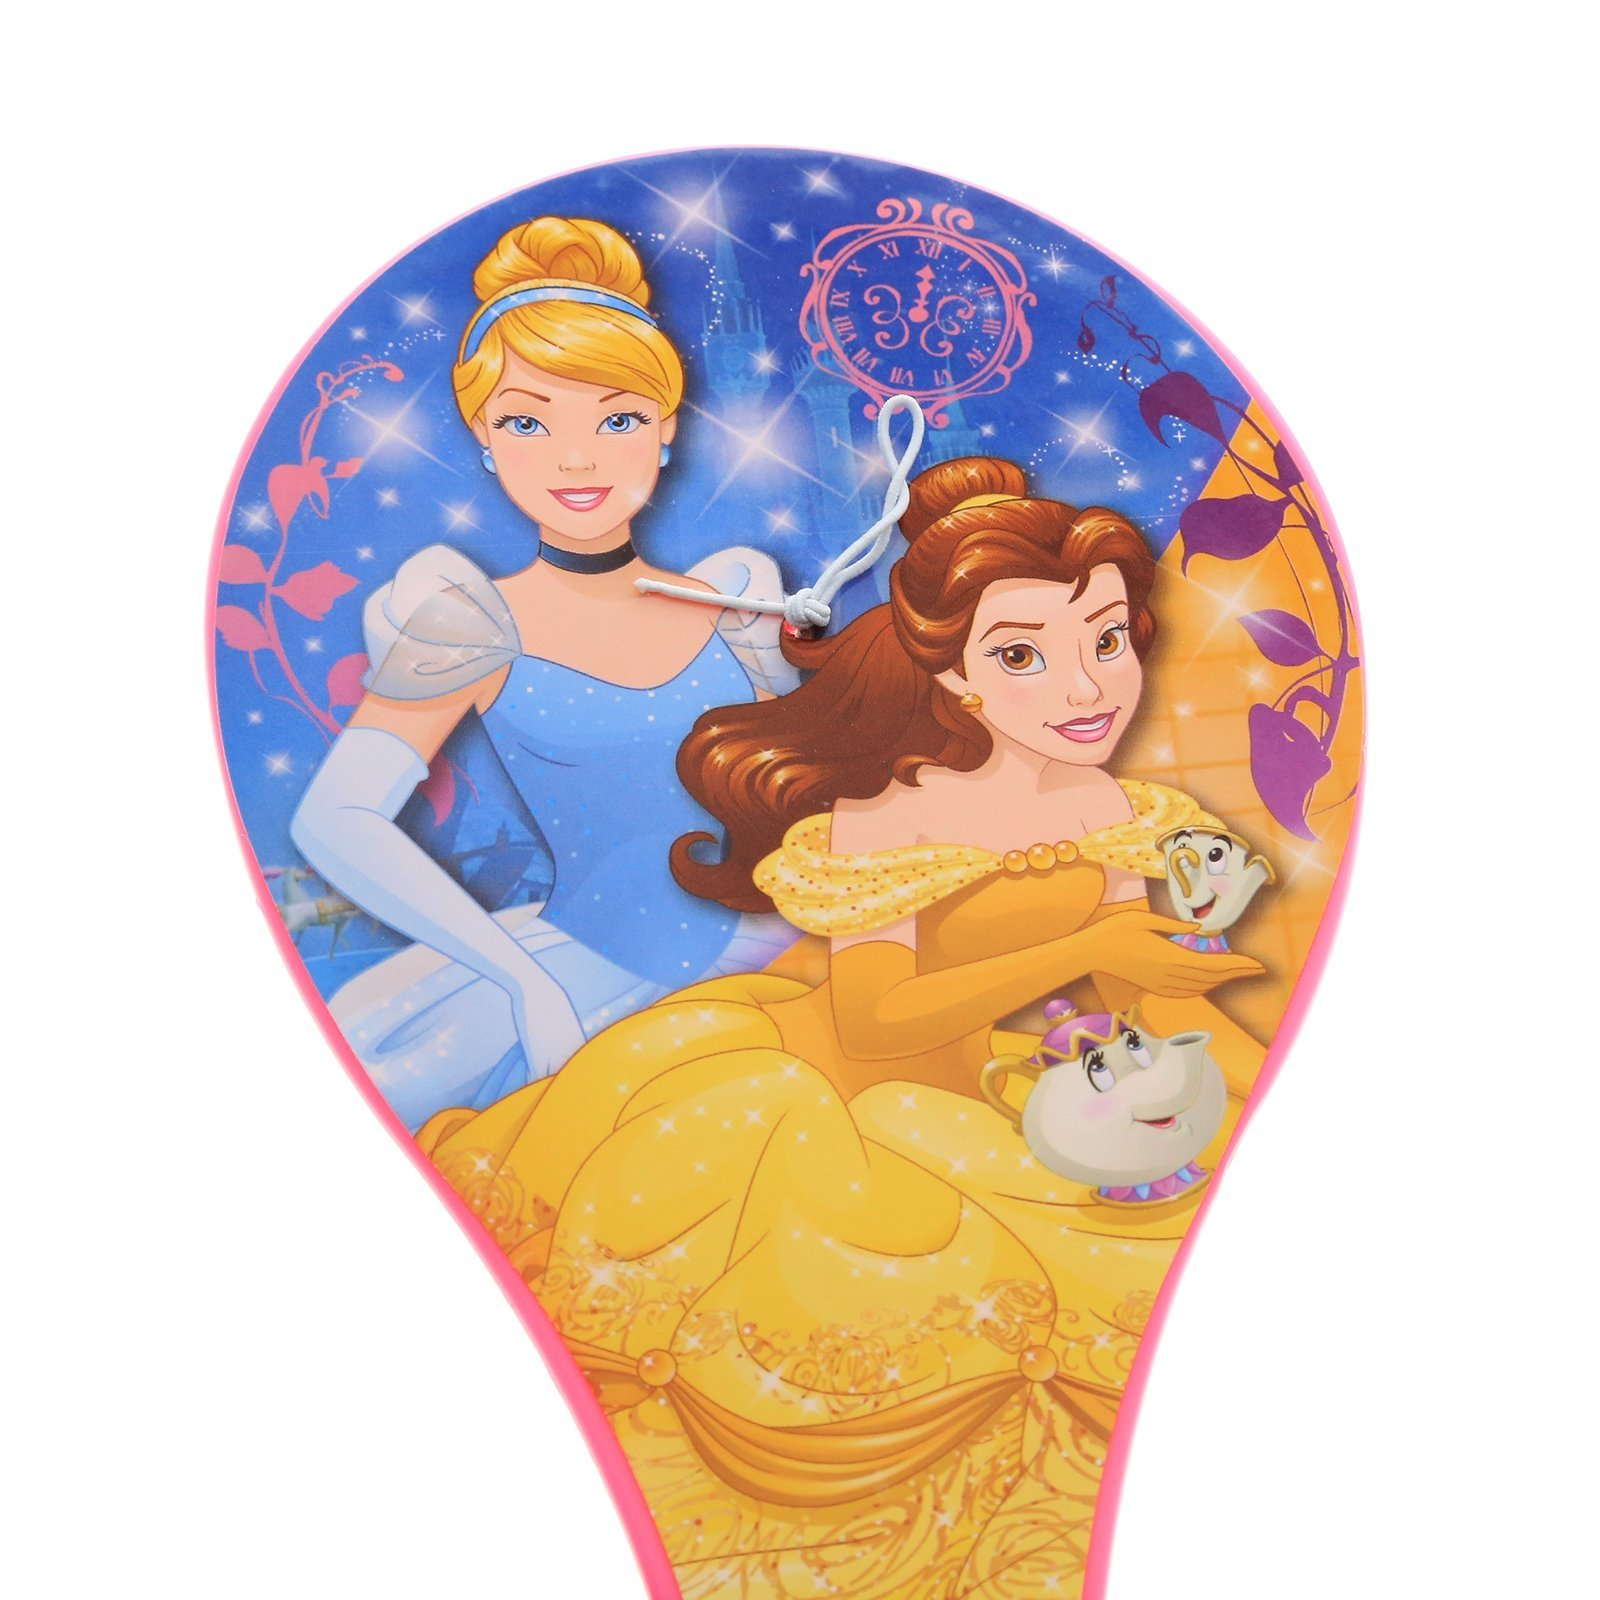 Disney Princess Girls Paddle Ball Toy Stocking Stuffer Party Favor Kids Gift